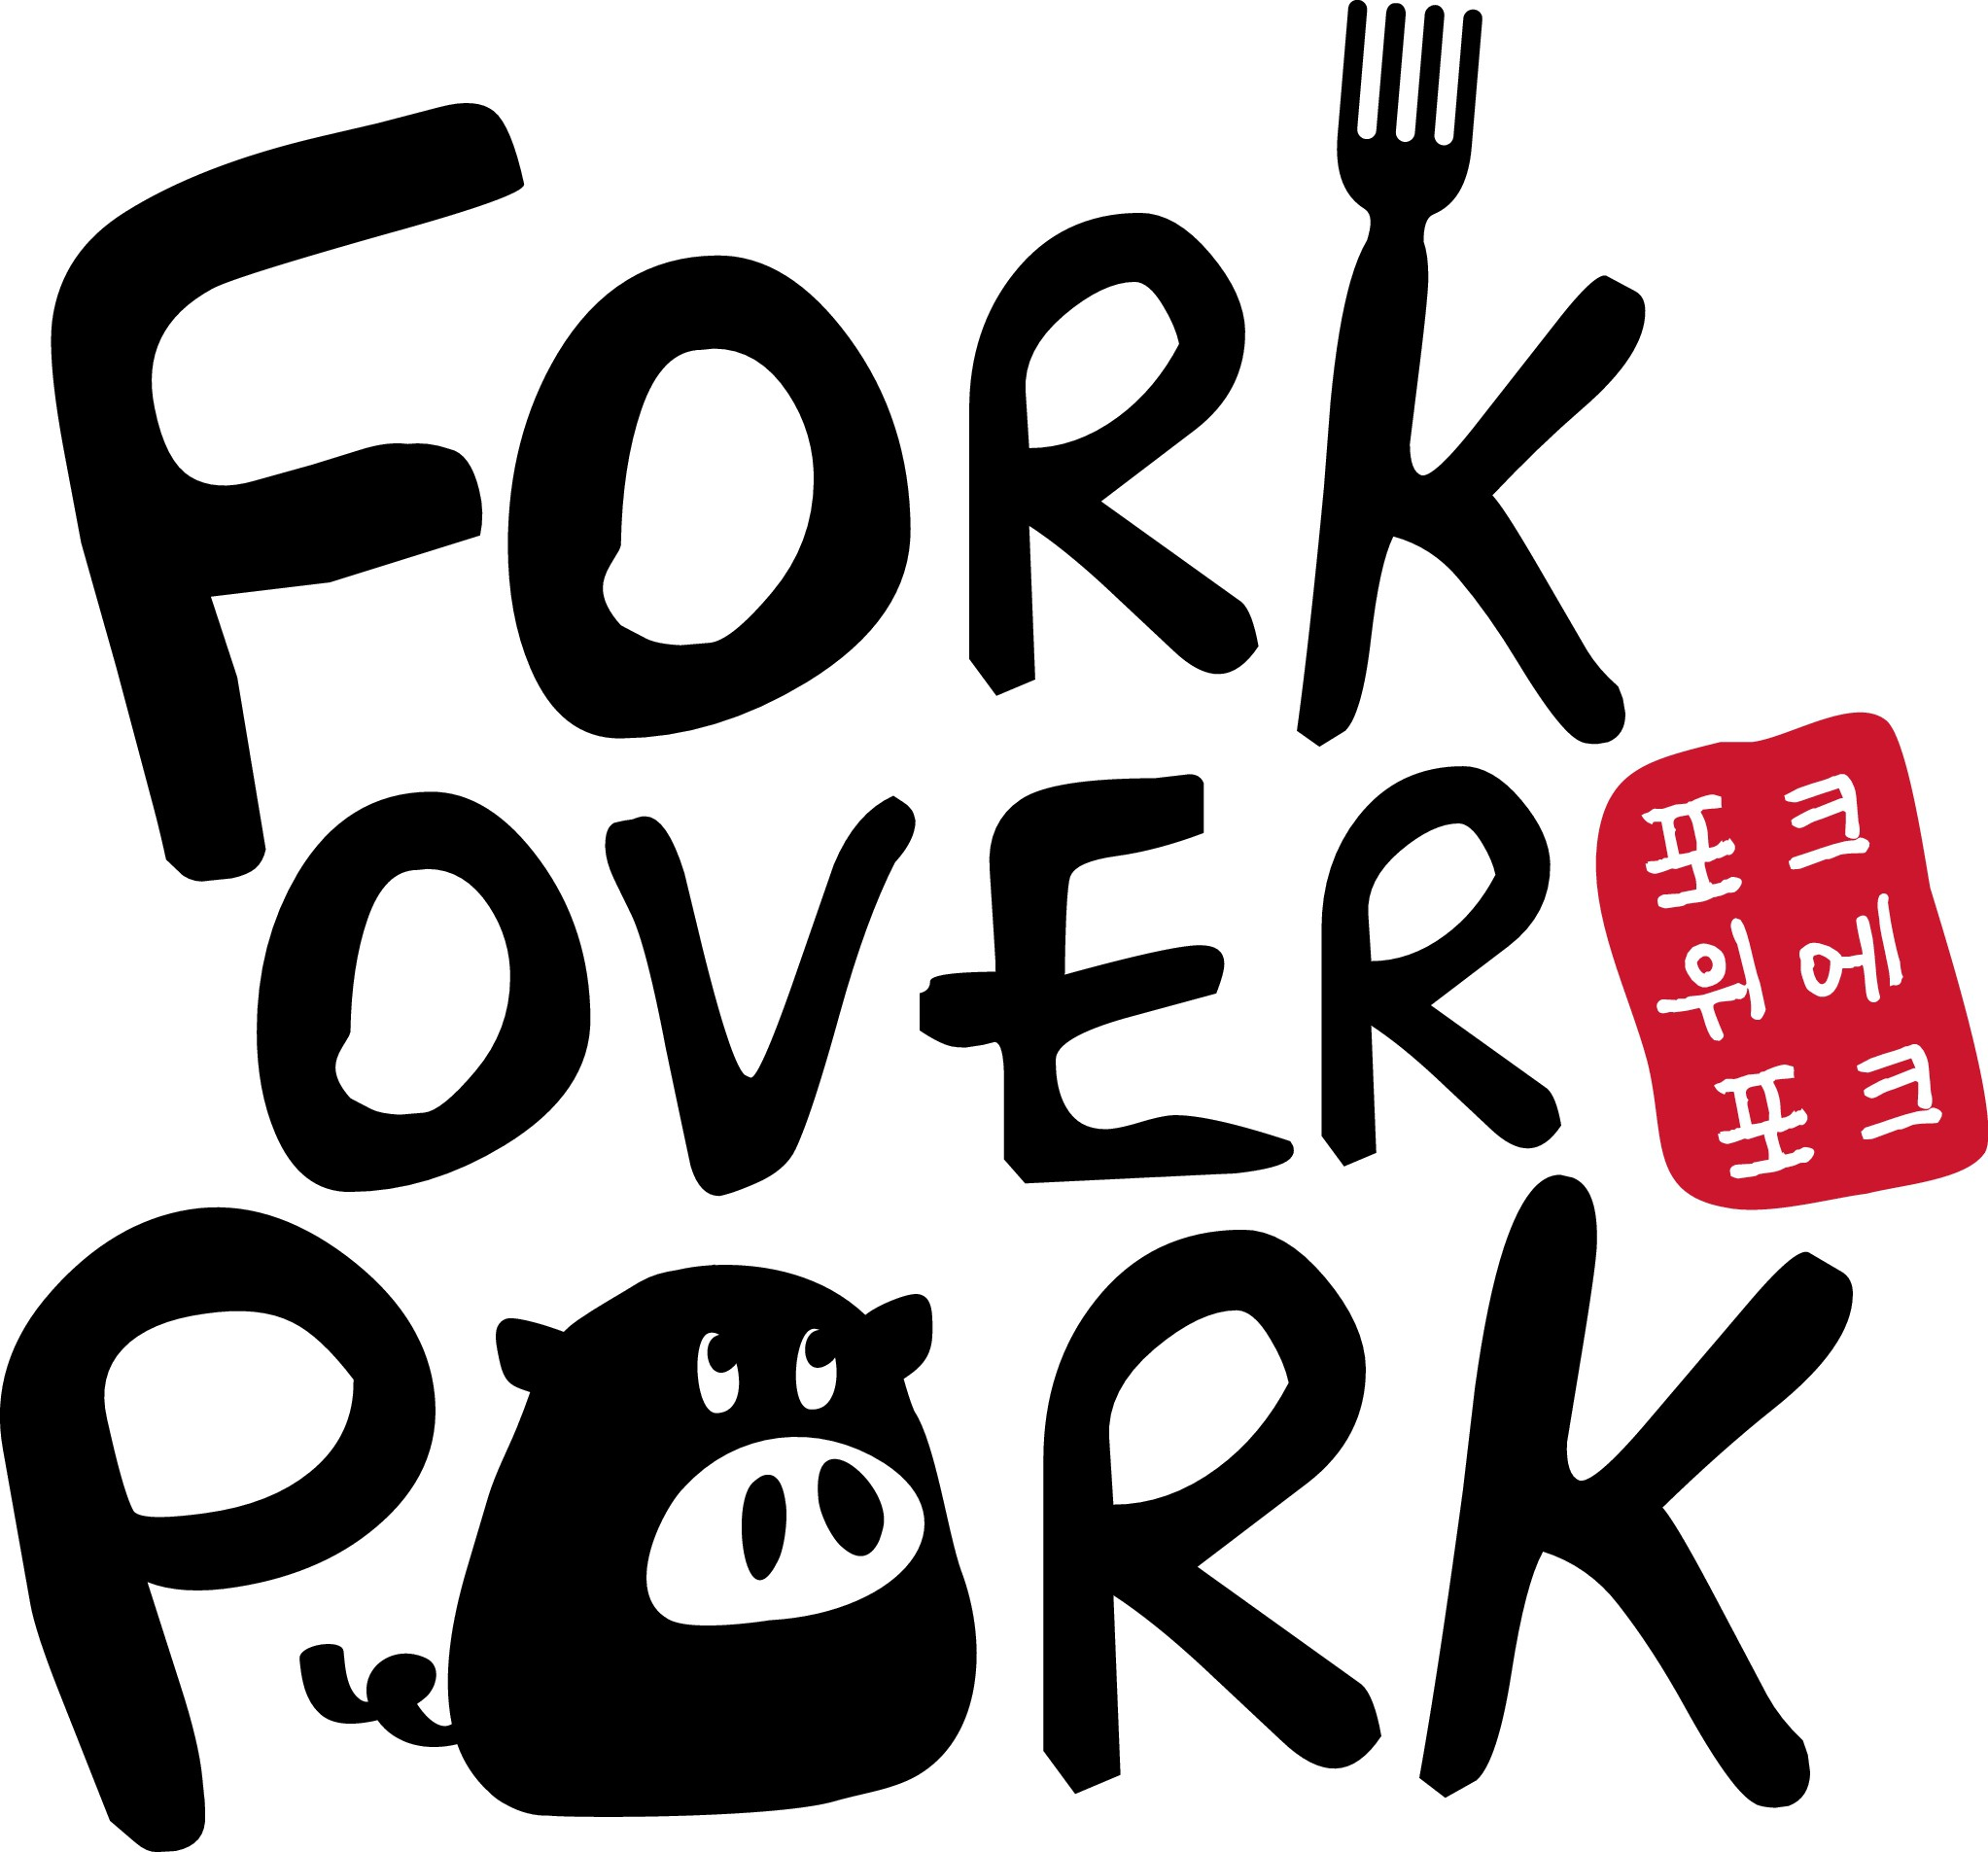 Logo and Business card for Fork Over Pork - A Korean Eatery